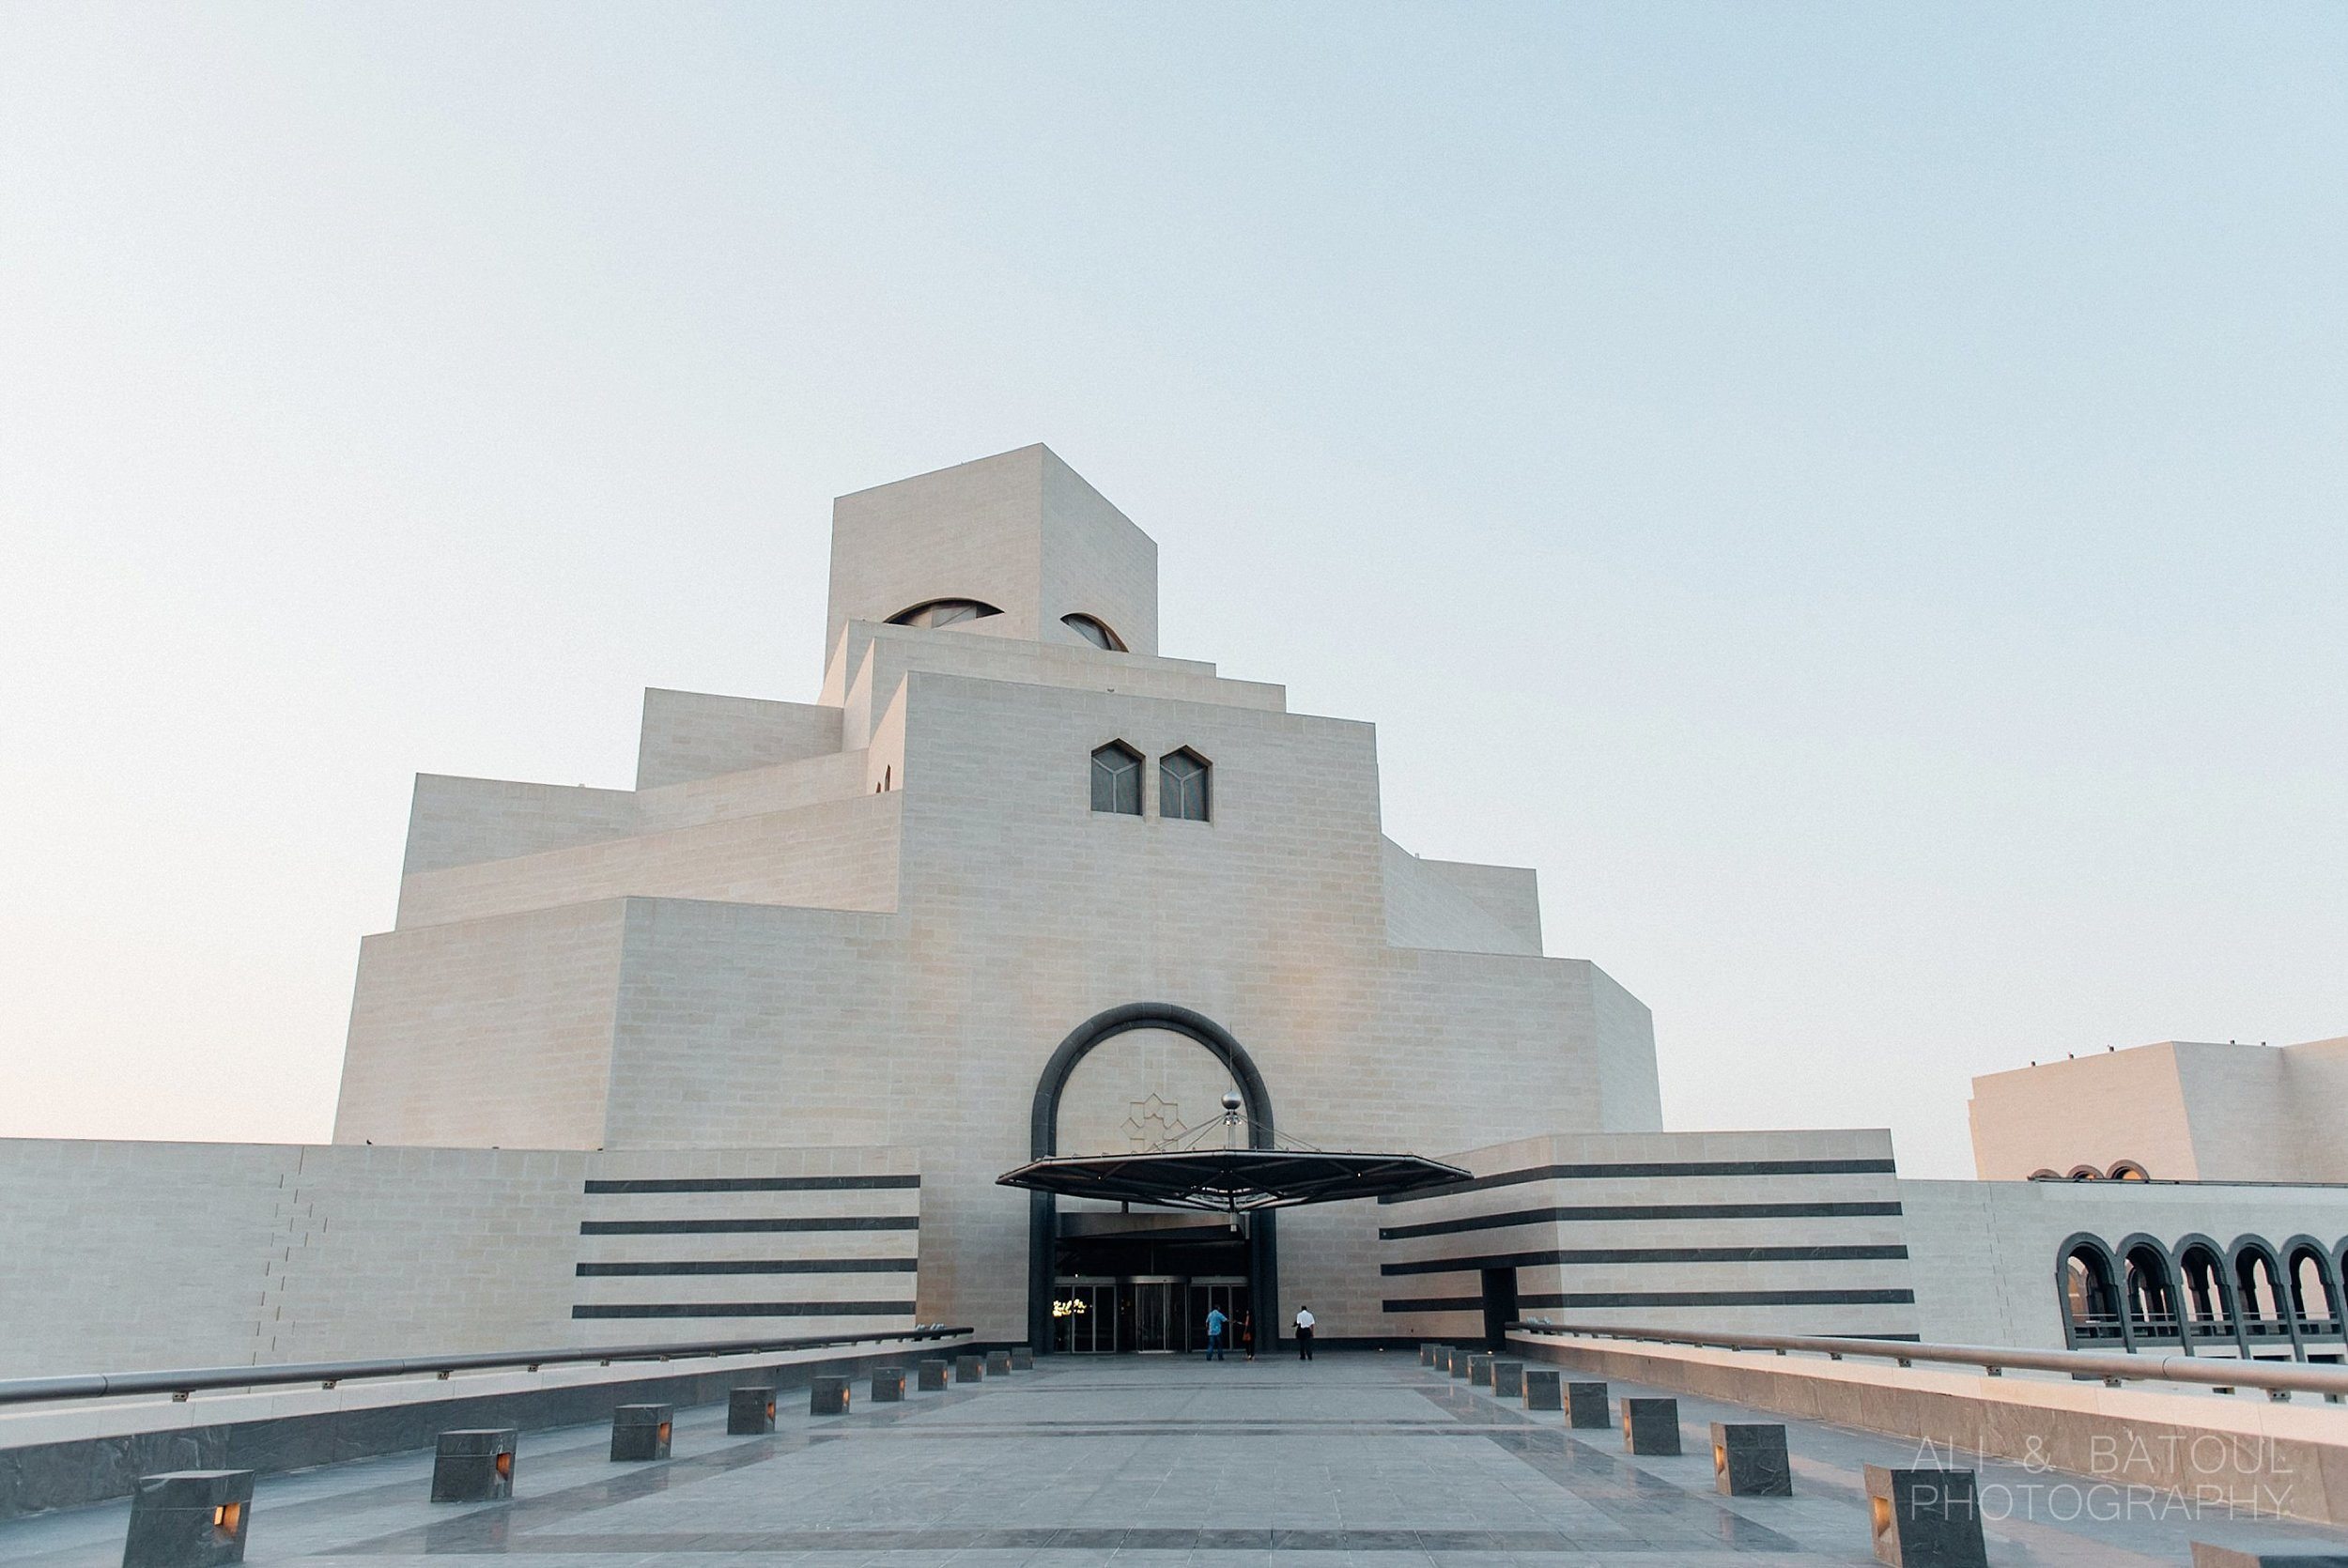 Ali & Batoul Photography - Doha Travel Photography_0010.jpg